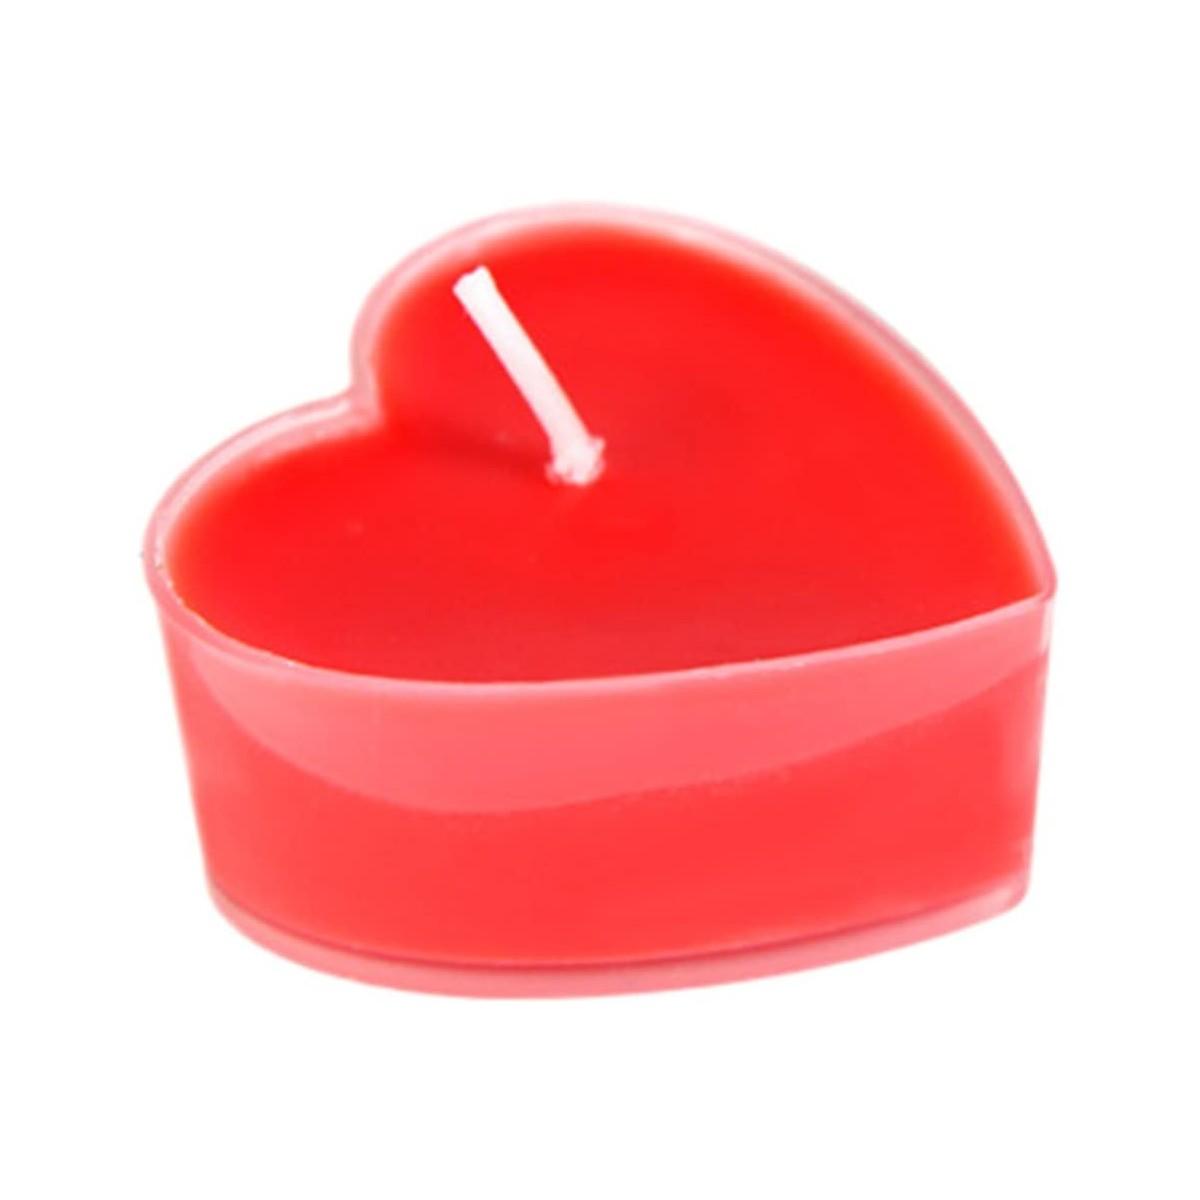 Set da 9 candele profumate a forma di cuore, per San valentino